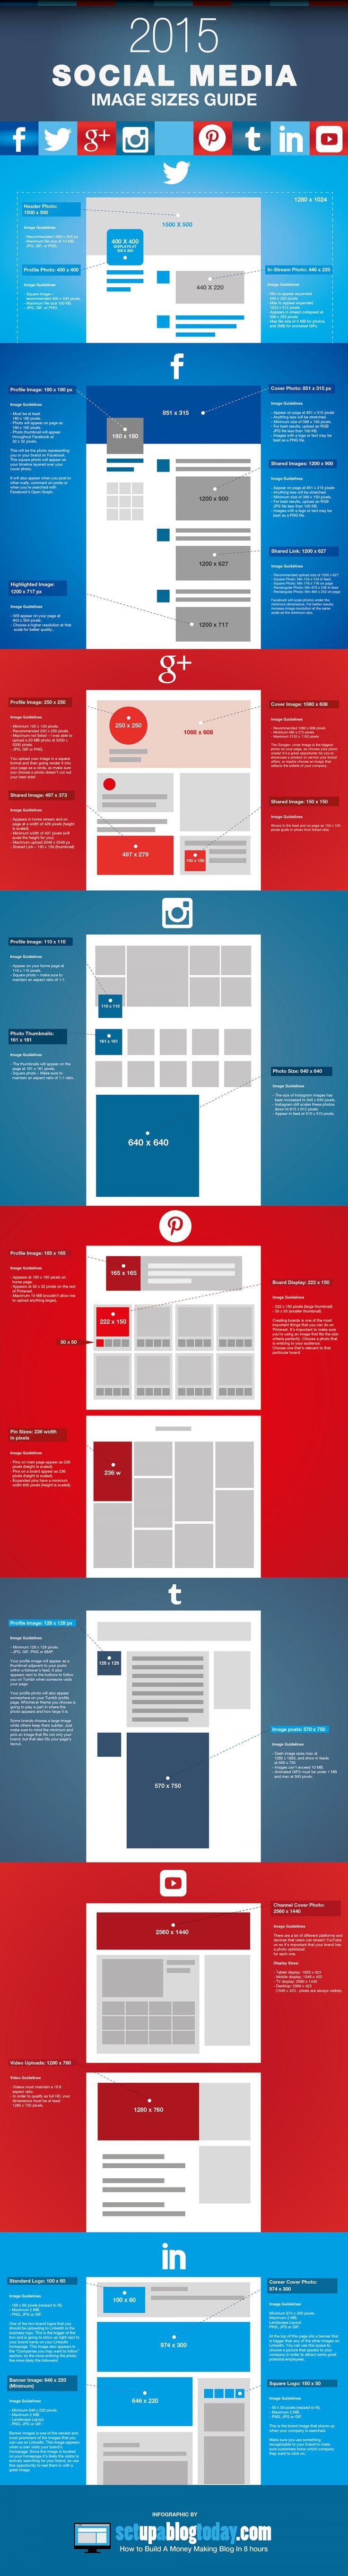 Cheat sheet of Social Media Image Sizes for 2015. #infographic #socialmedia